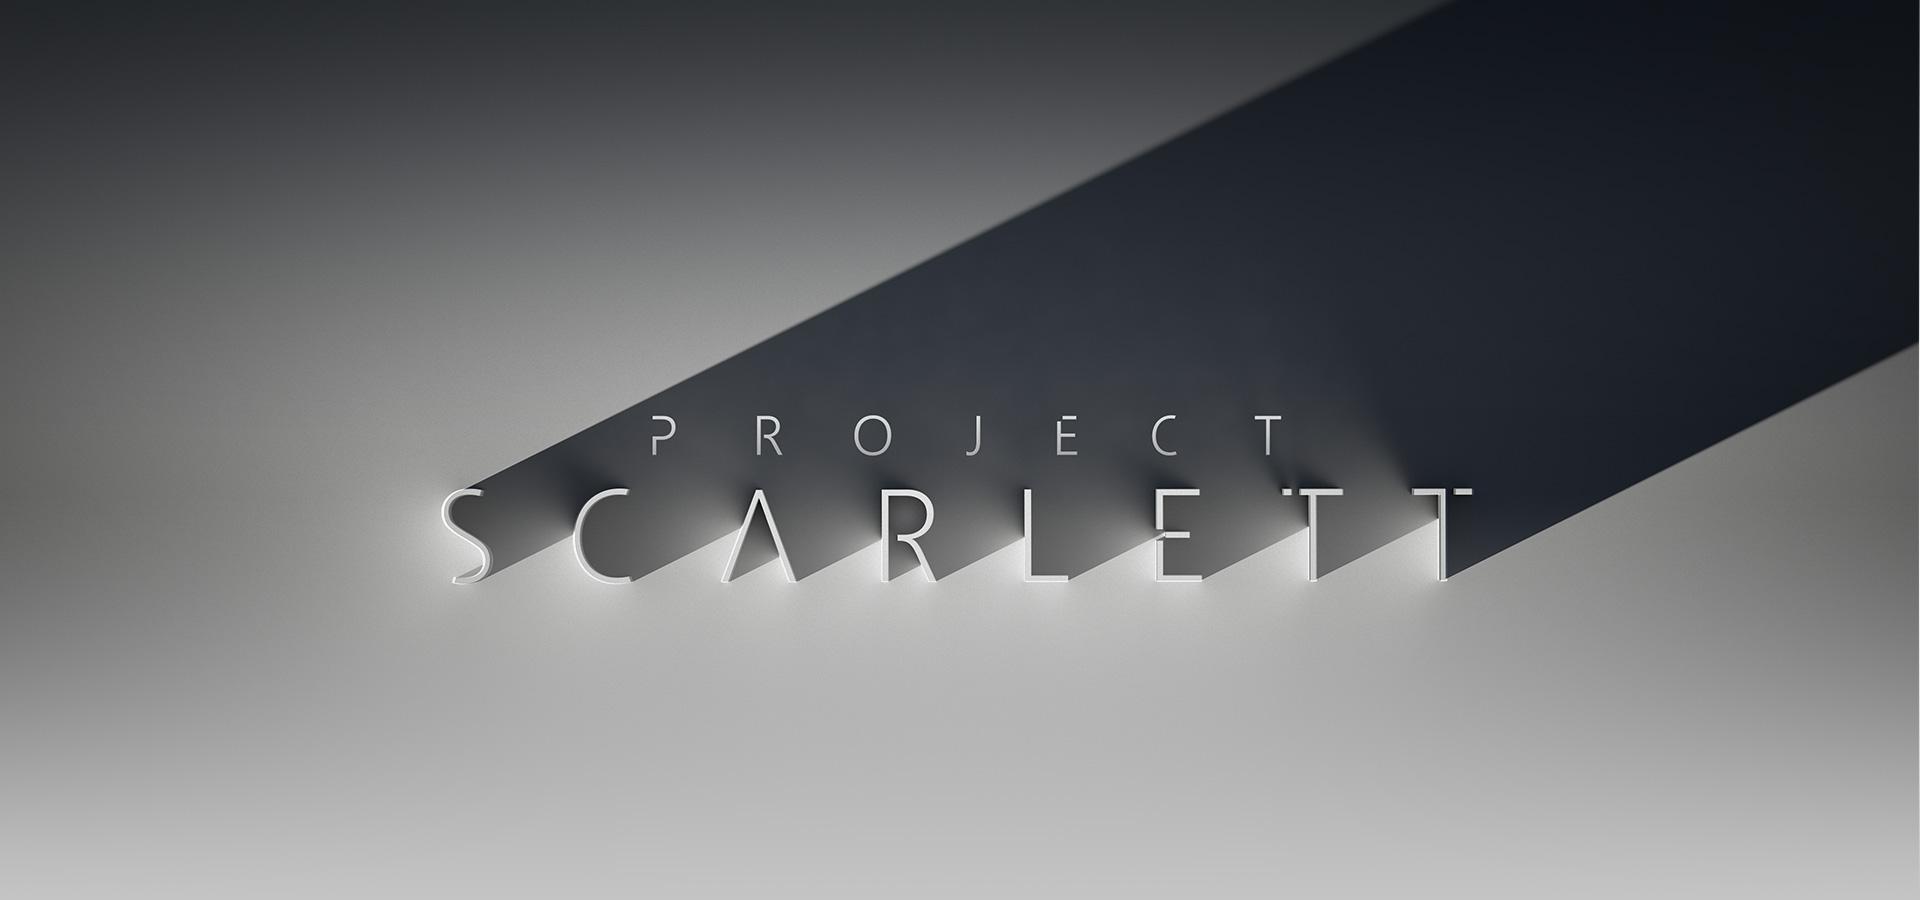 Xbox Project Scarlett console